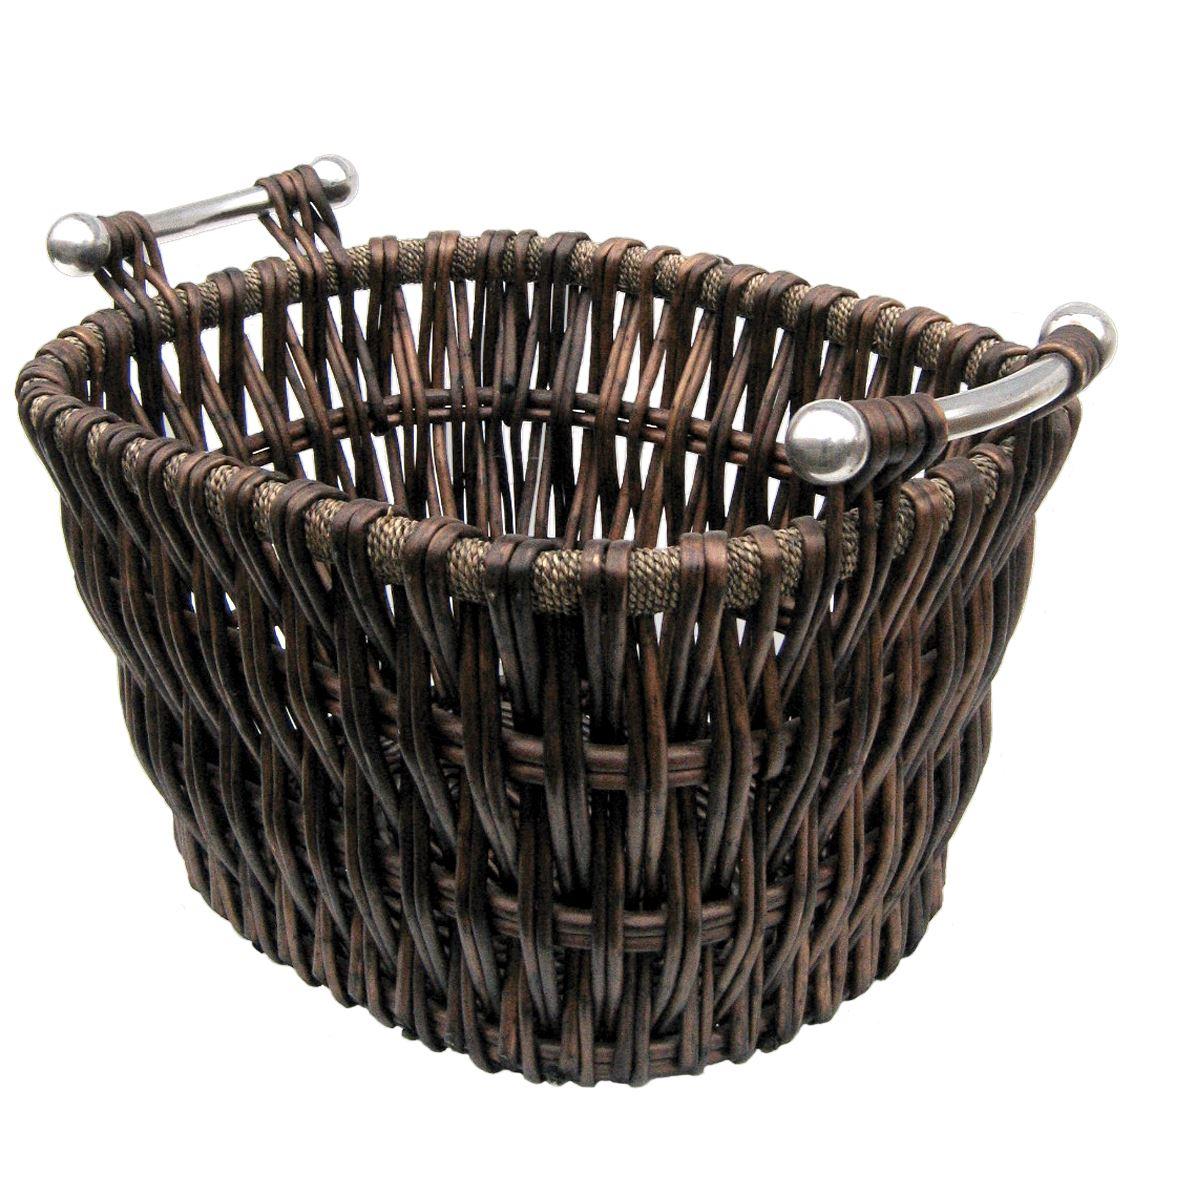 Basket Weaving Supplies Canberra : Manor bampton willow basket log carrier holder with